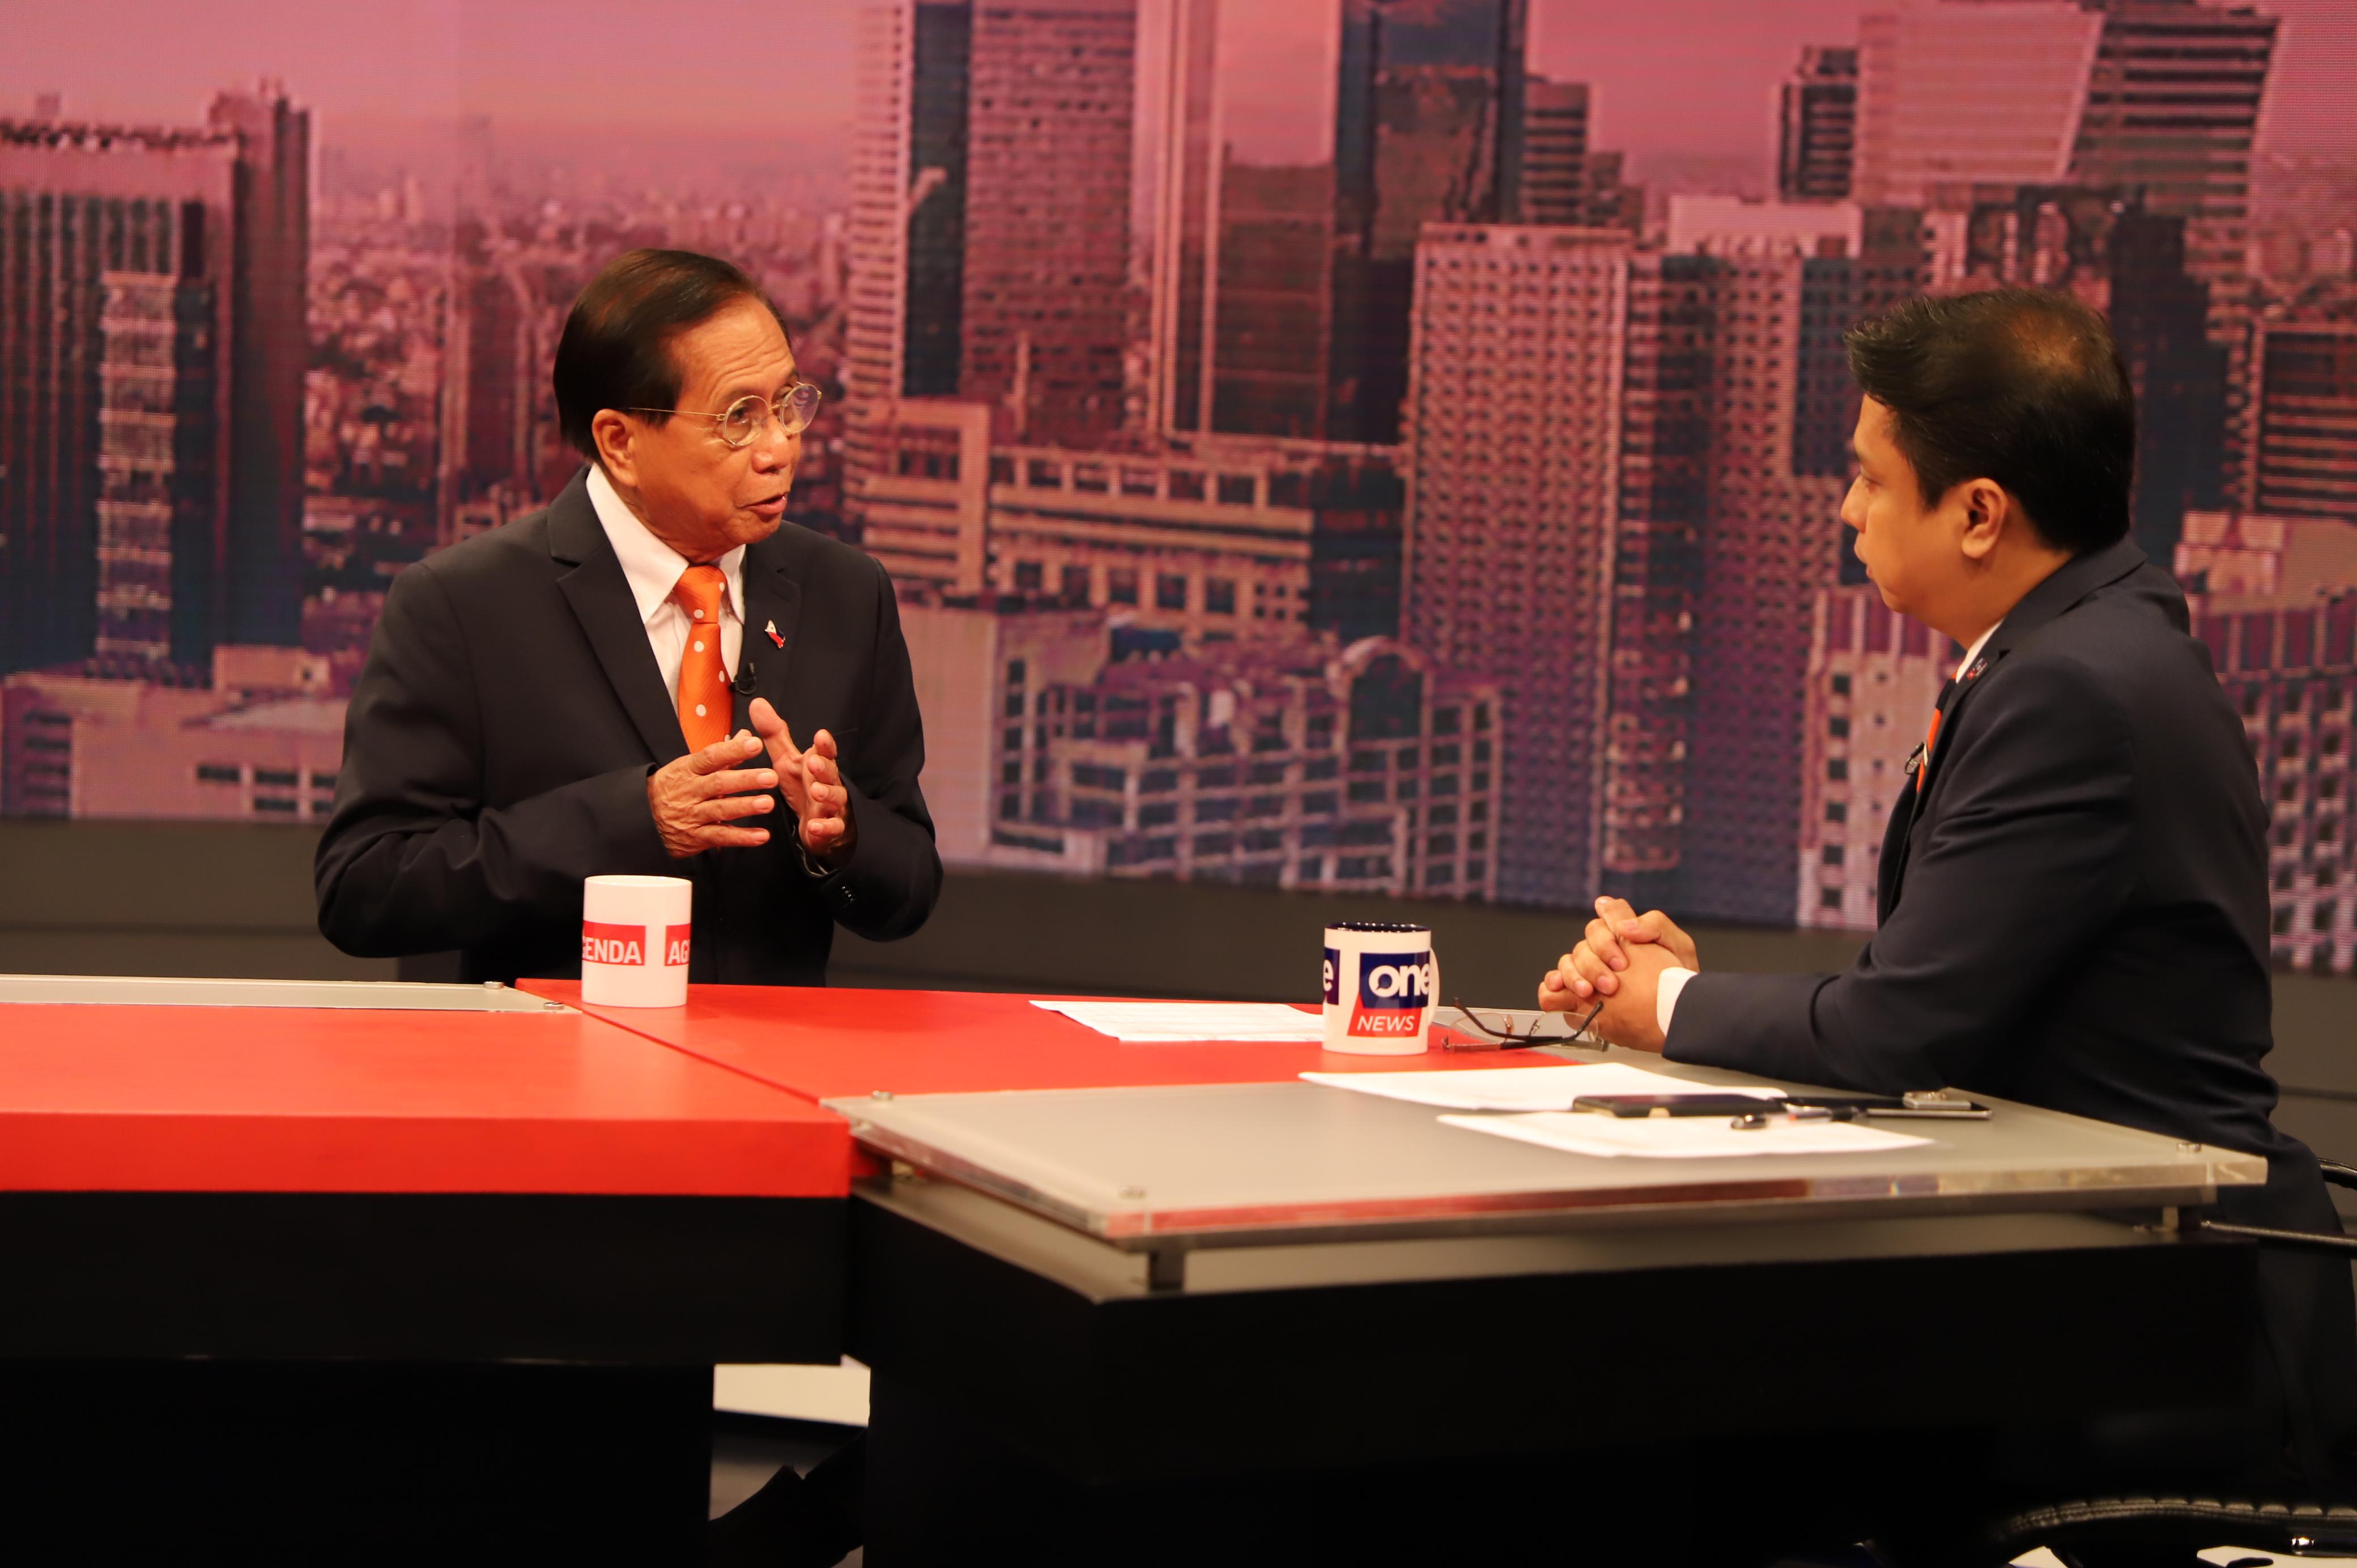 Improvement of governance seen in new Bangsamoro region